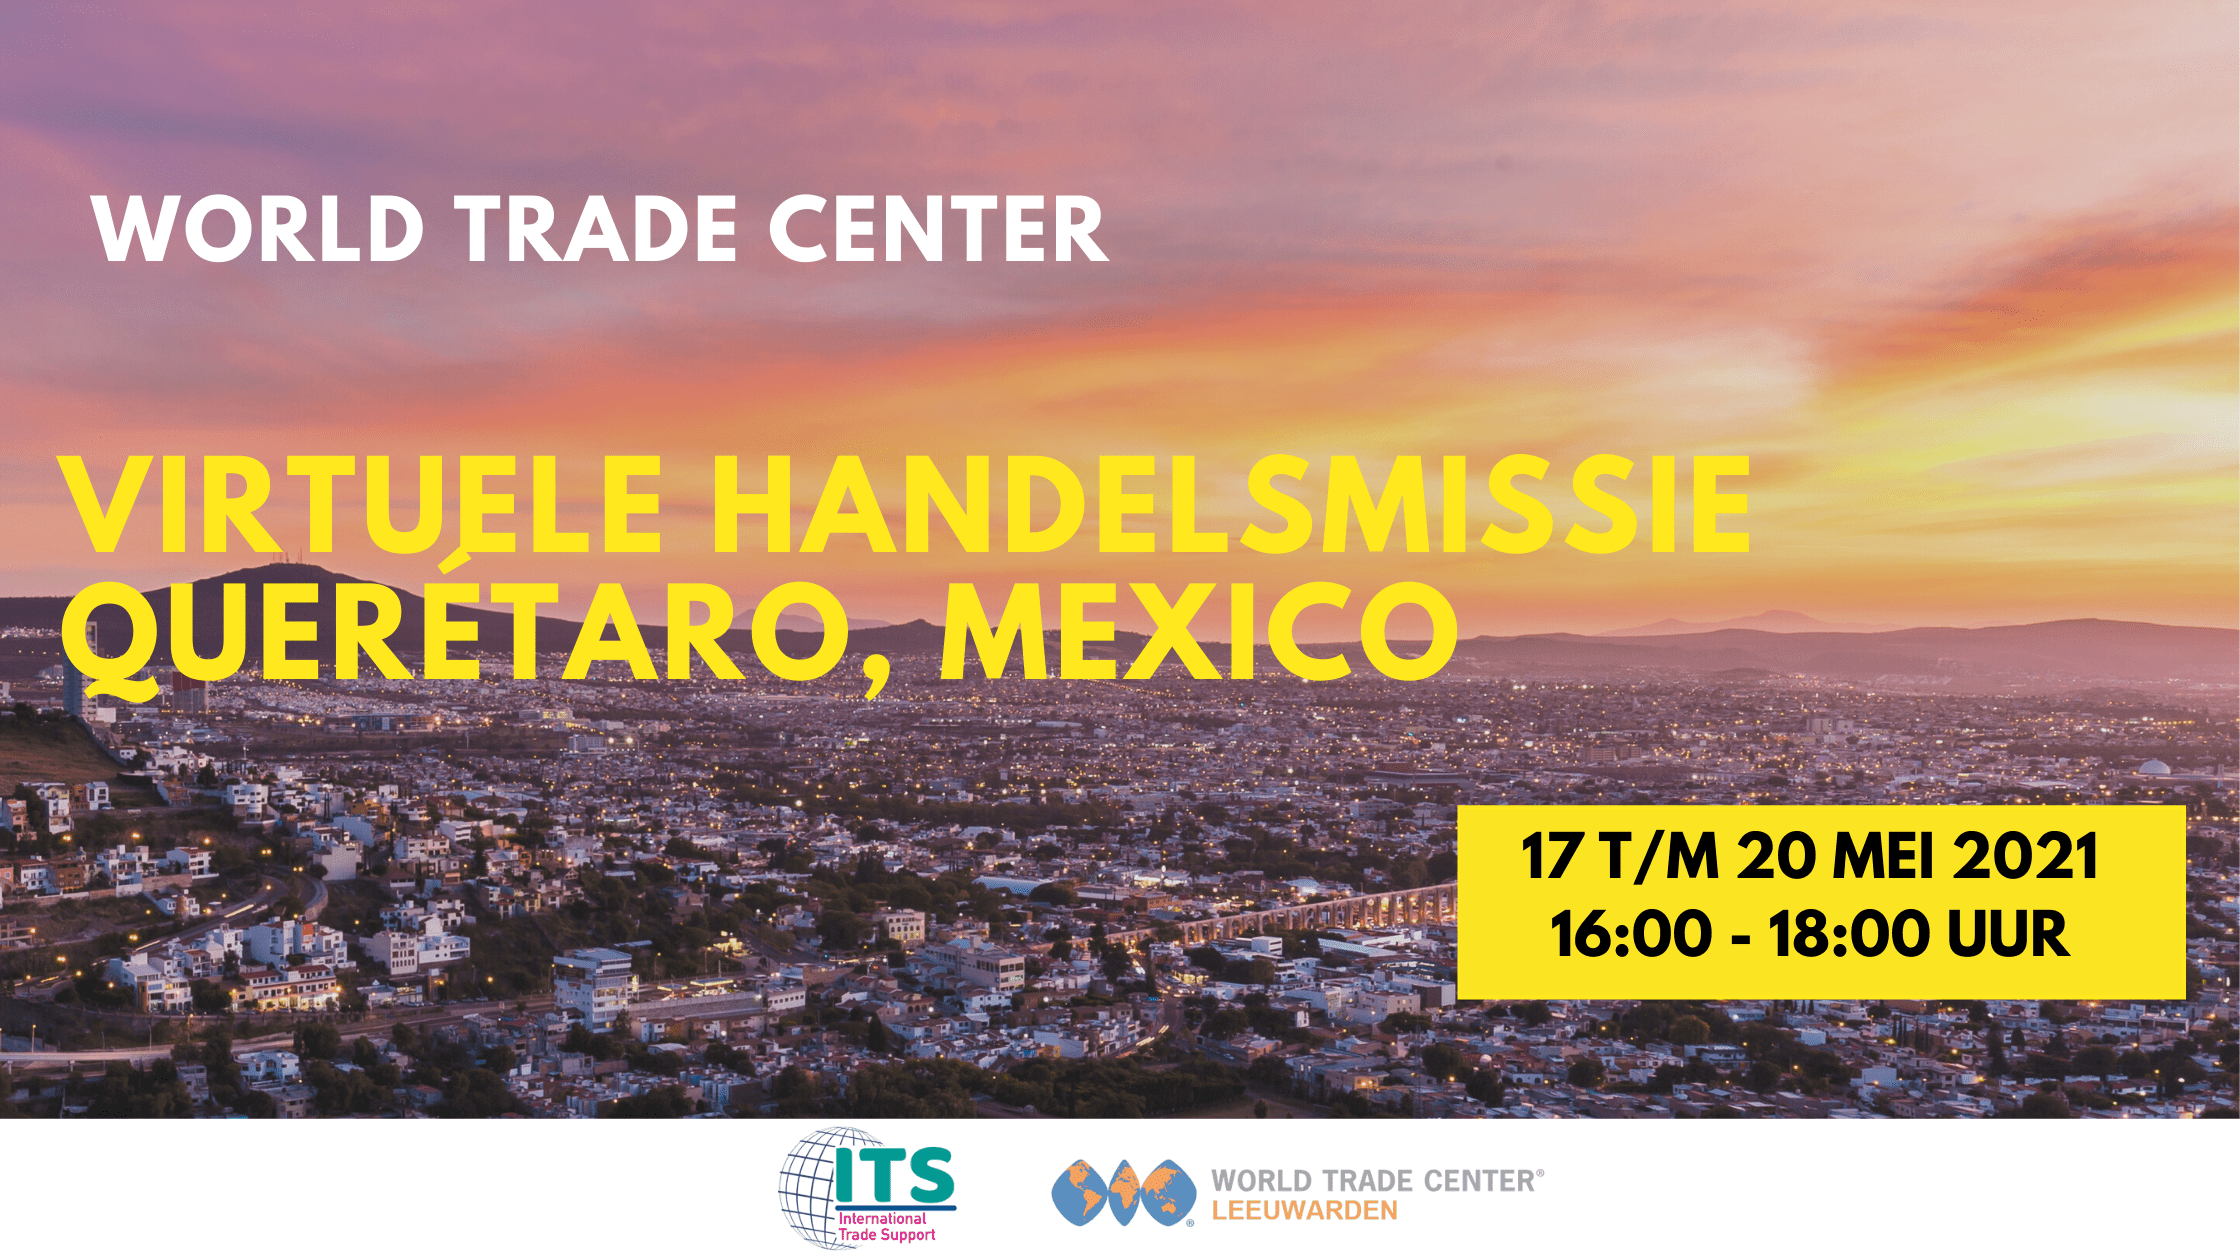 Virtuele handelsmissie Queretaro / Mexico | WTC Leeuwarden